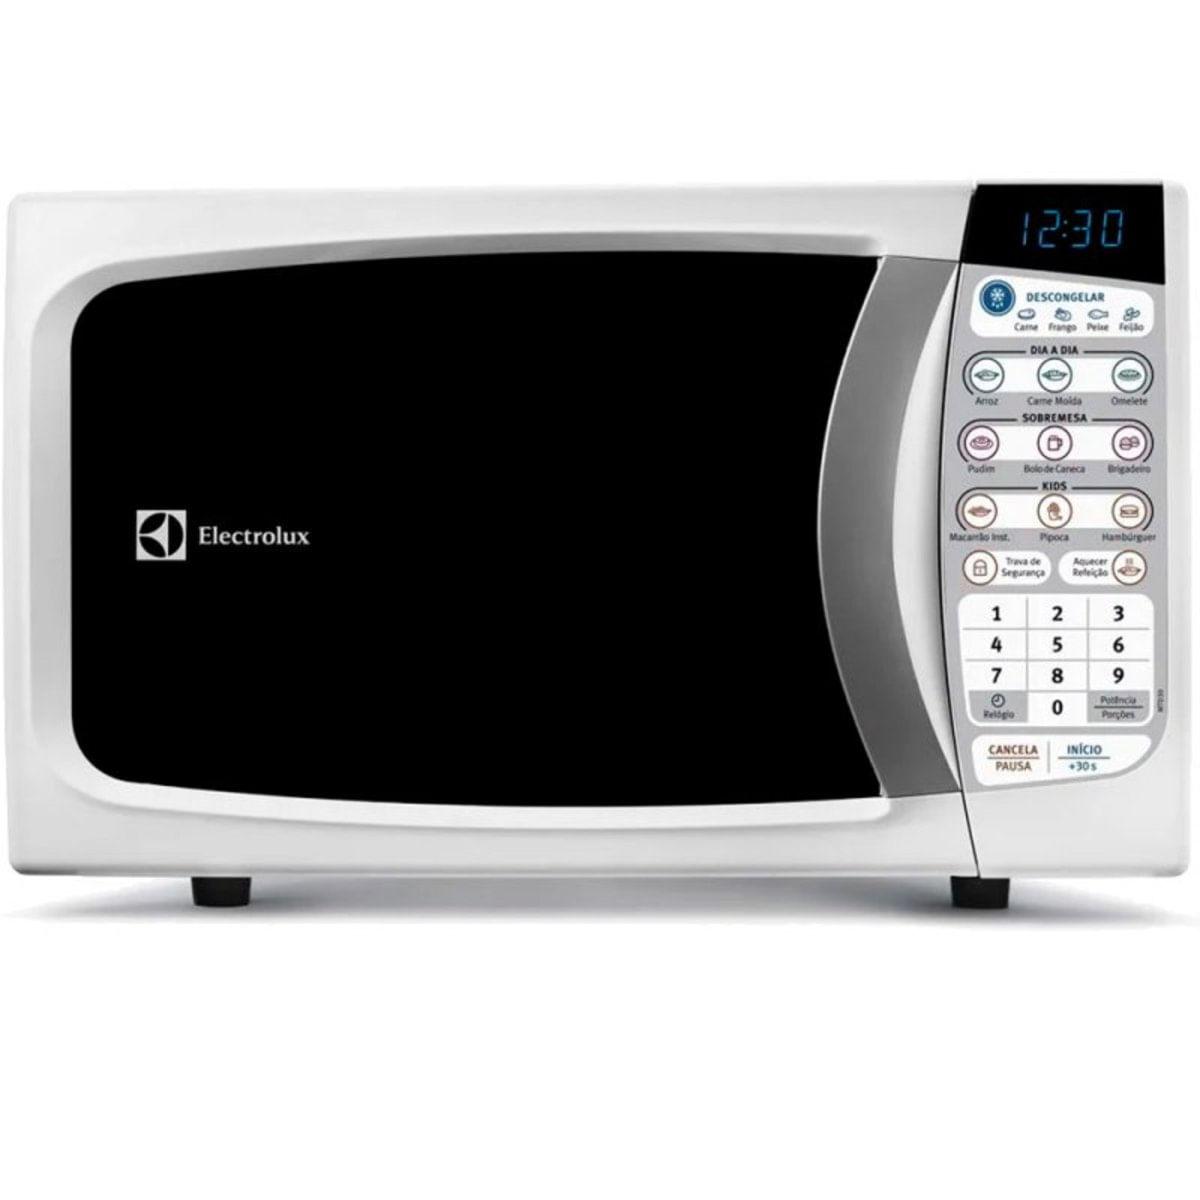 Micro-ondas Electrolux MTD30 20 Litros Branco 110V